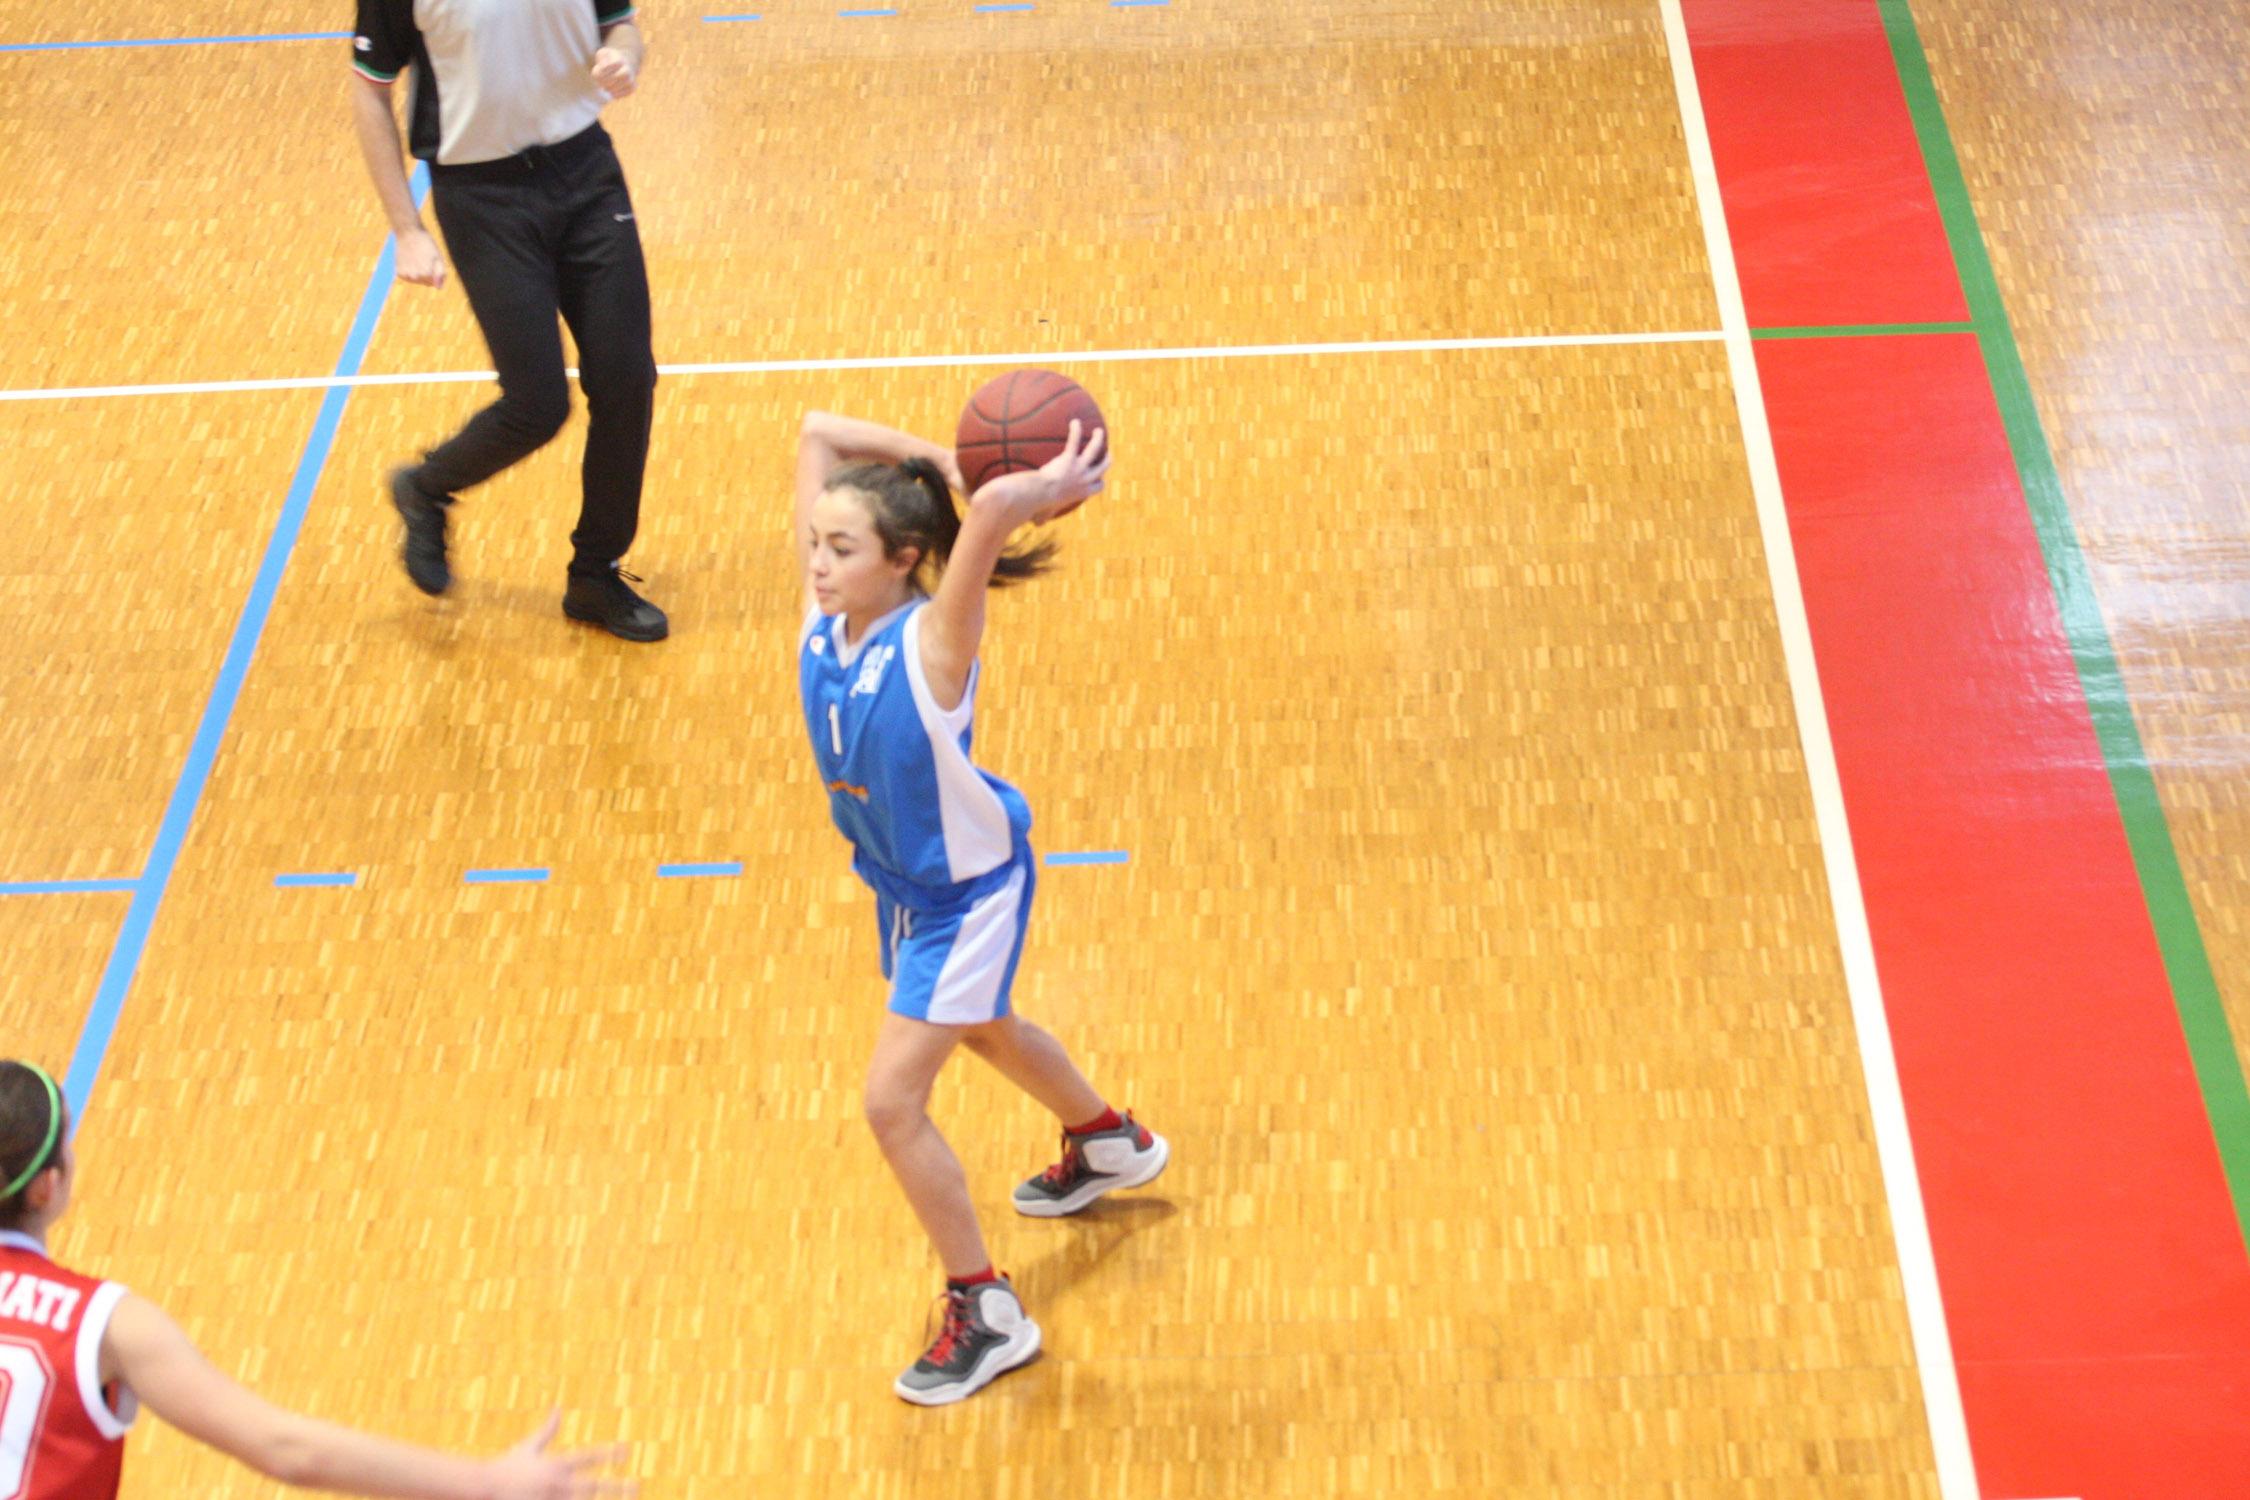 U16E - Costa Masnaga vs Baskettiamo Vittuone 2001 00026.jpg